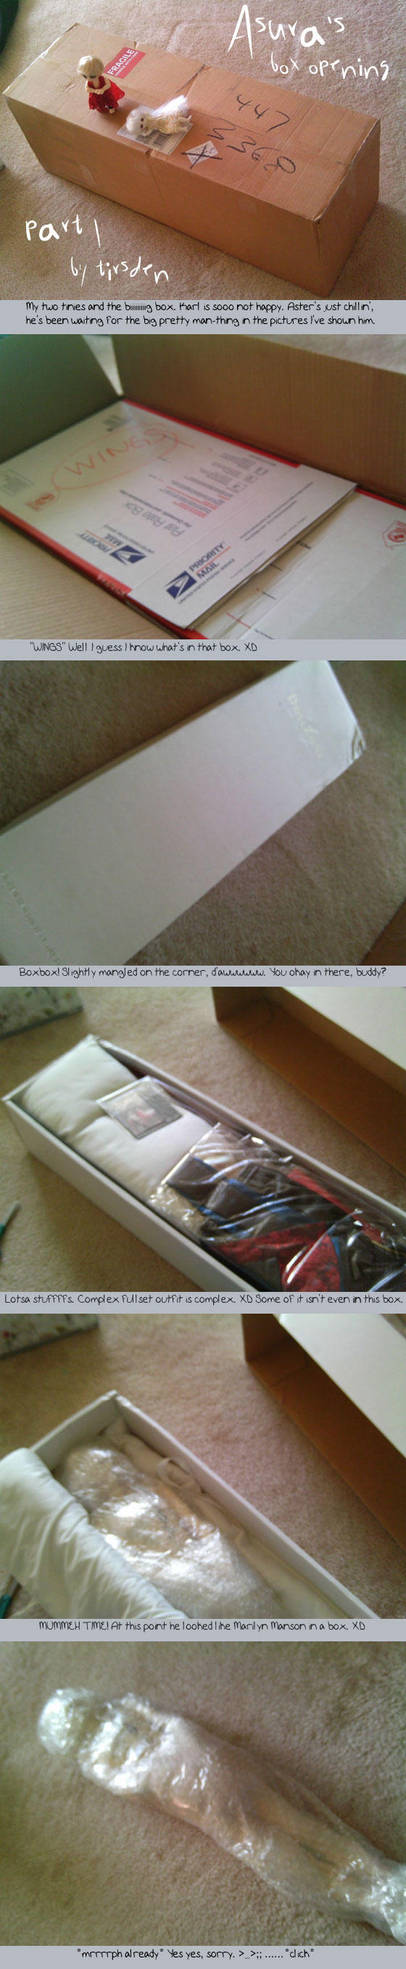 Asura's box opening part 1 by tirsden